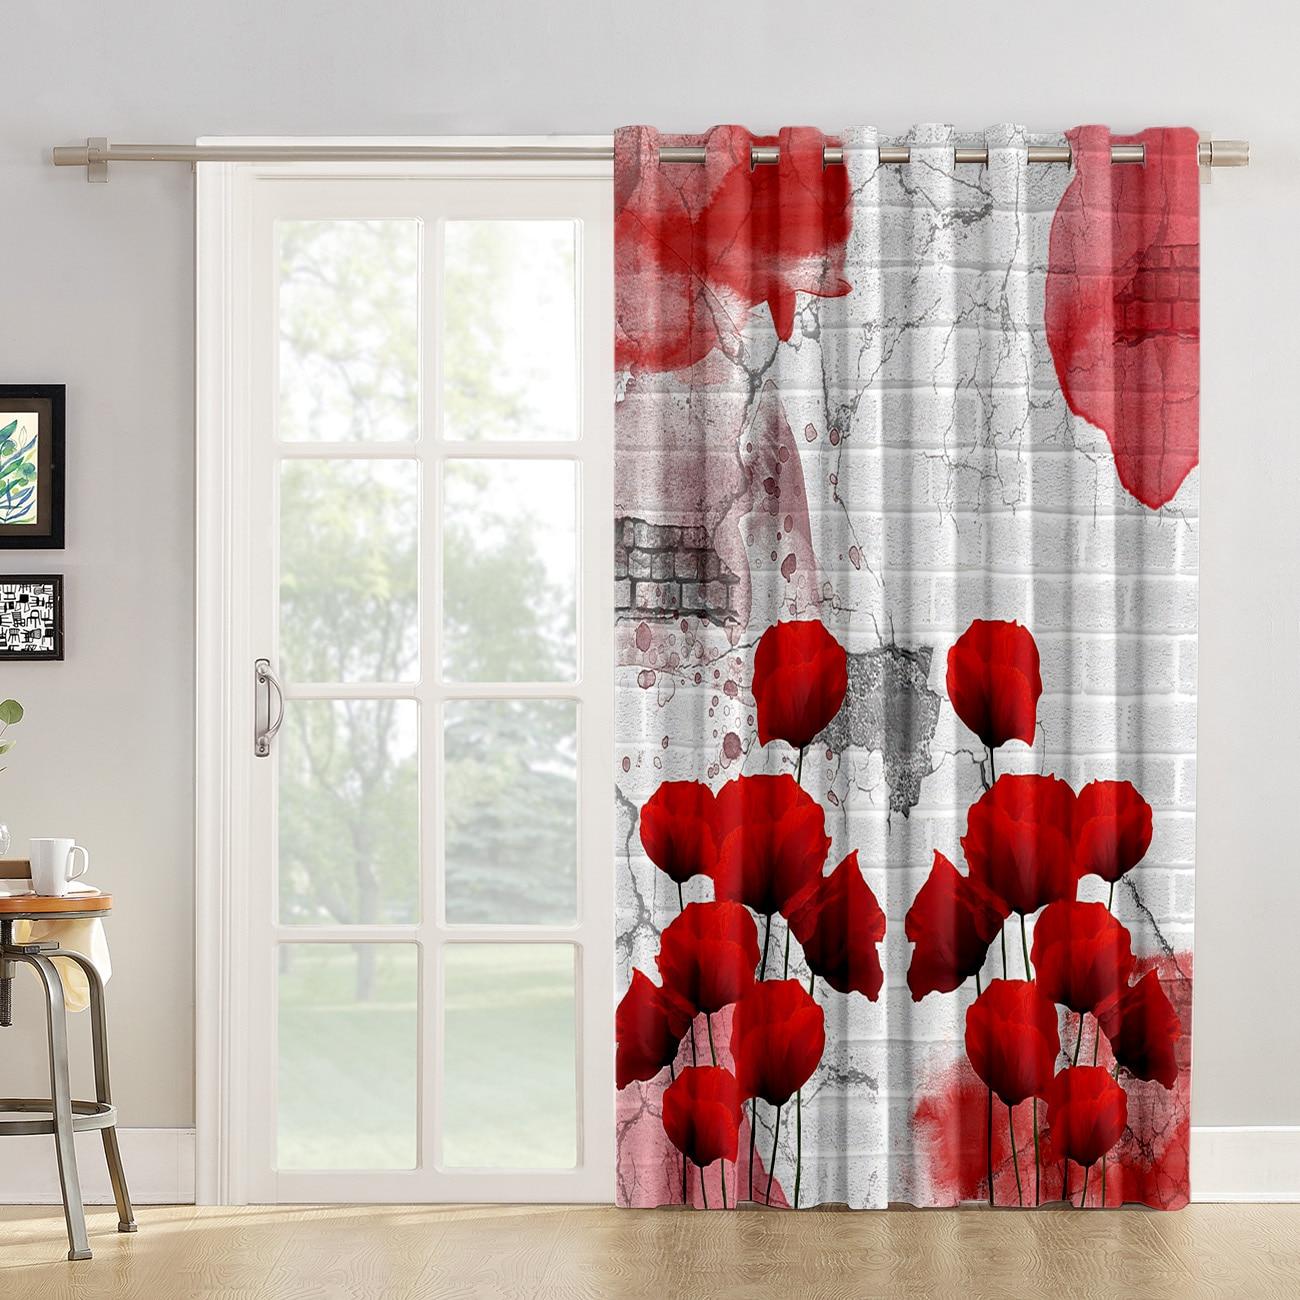 poppy flower room curtains large window living room kitchen drapes indoor window treatment ideas window curtain panels